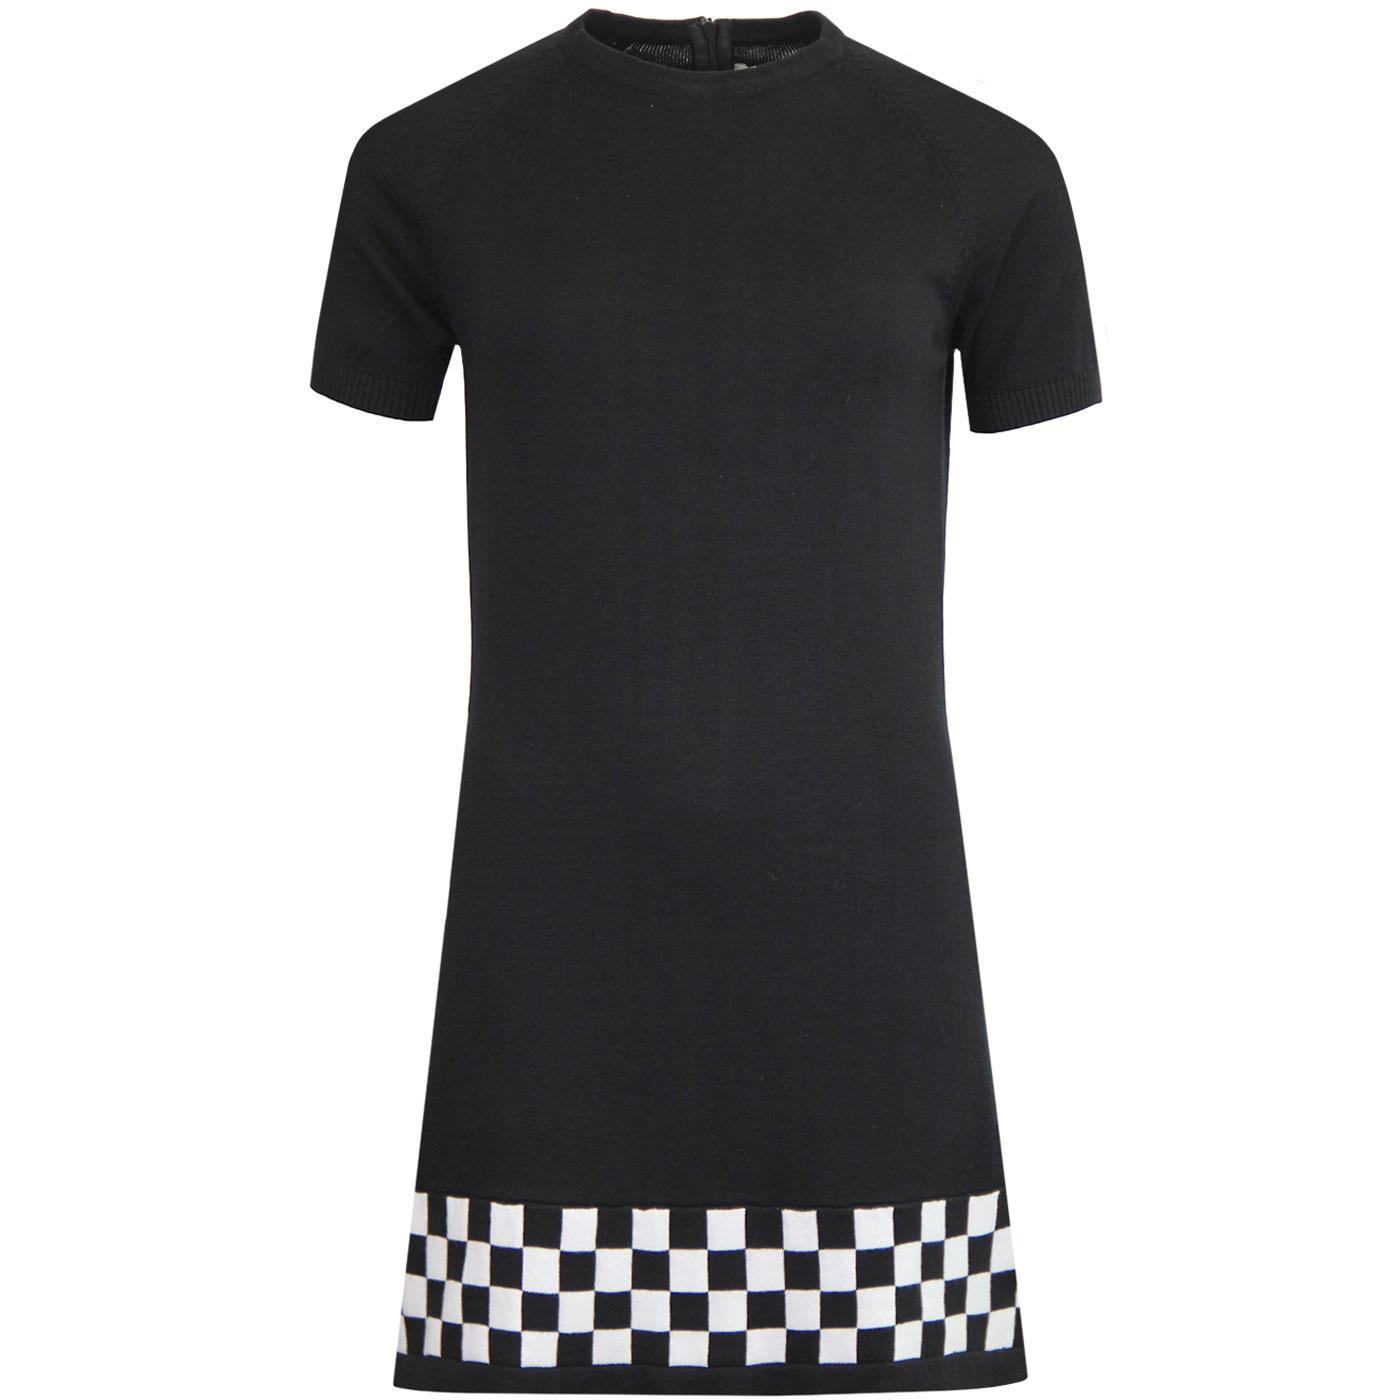 Nicole MADCAP ENGLAND Mod Knit Checkboard Dress